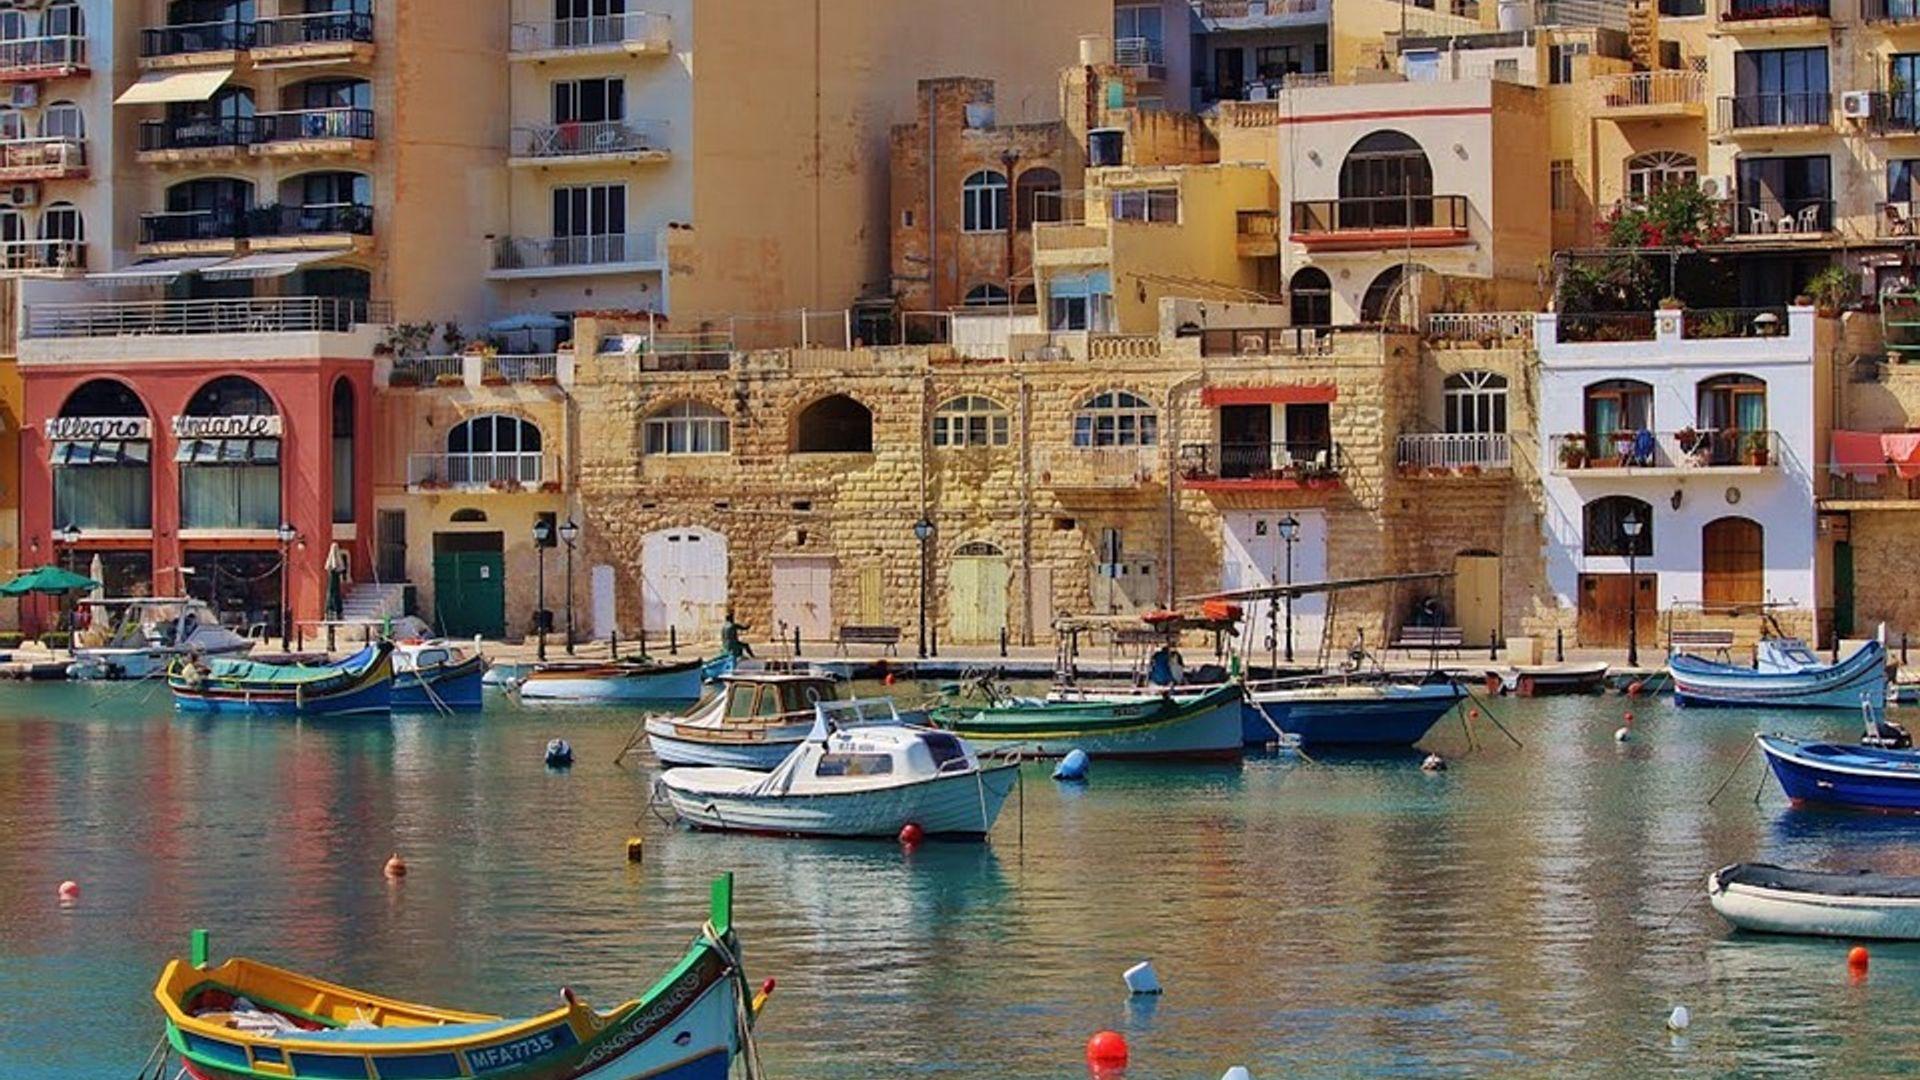 Sejur charter Malta - 6 zile - ianuarie 2022